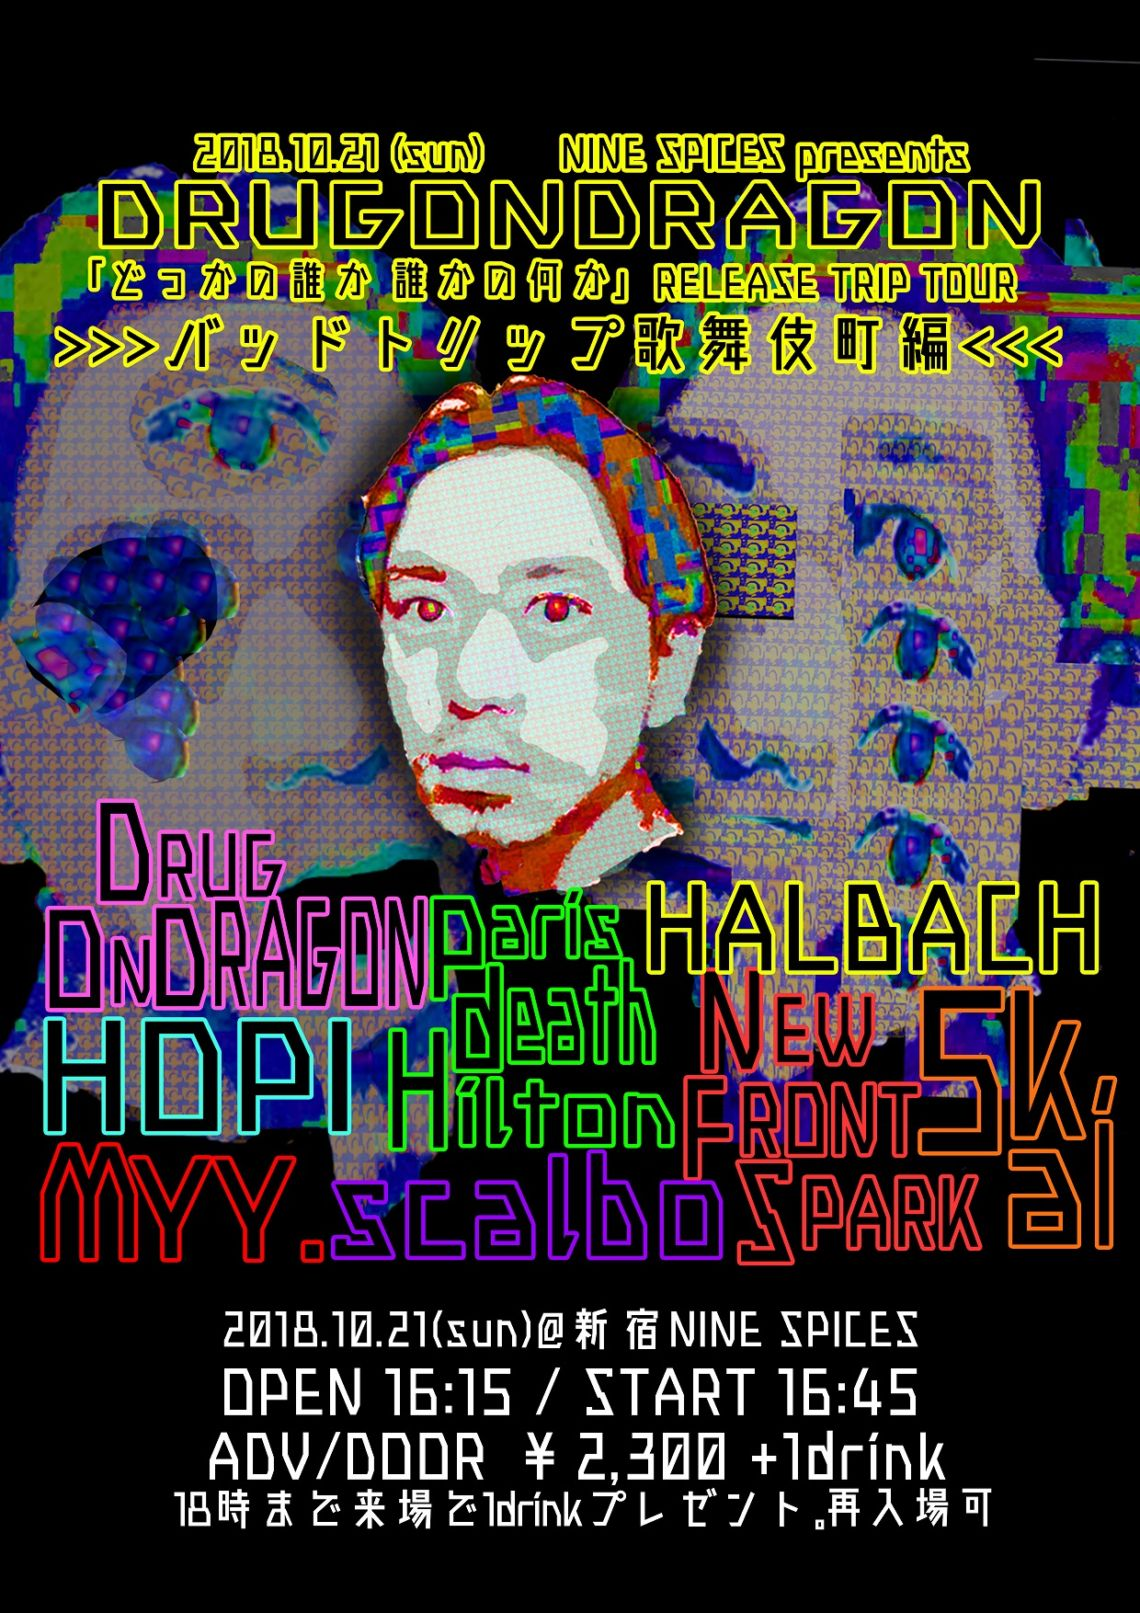 "NINE SPICES presents ""DRUGONDRAGON 『どっかの誰か 誰かの何か』 RELEASE TRIP TOUR ~バッドトリップ歌舞伎町編~"""